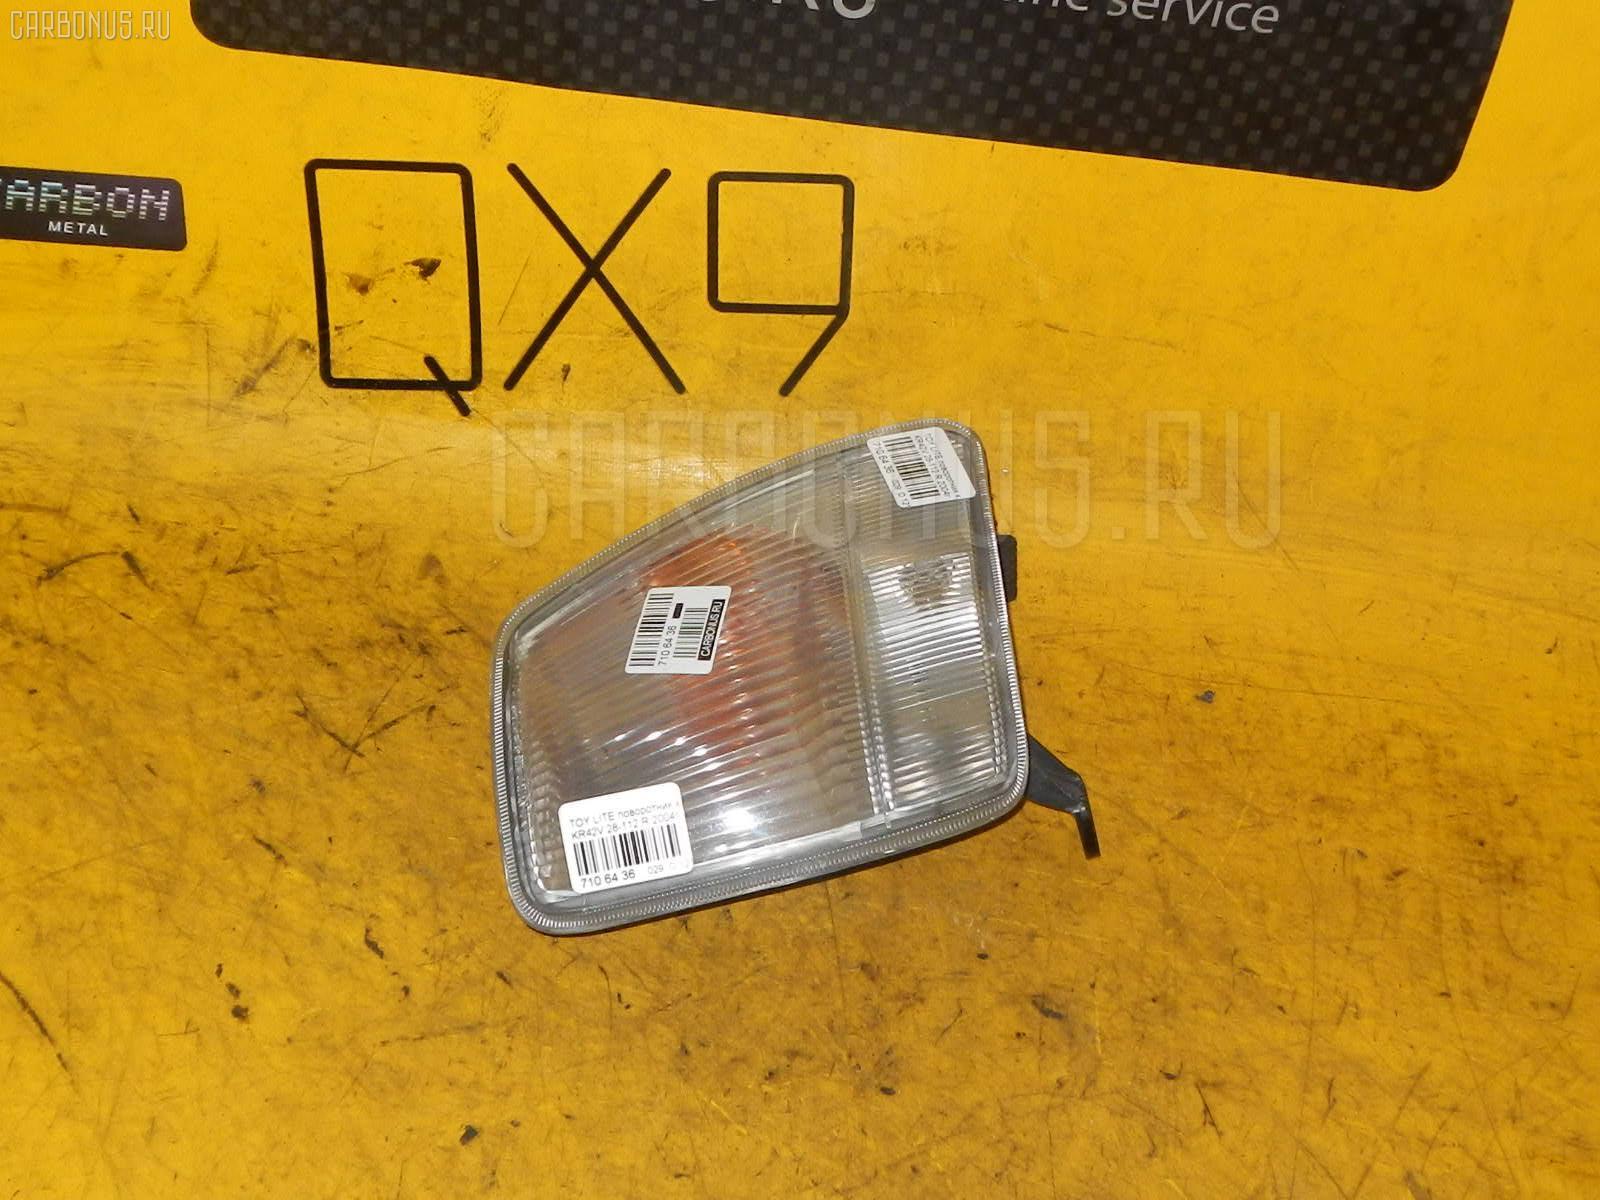 Поворотник к фаре Toyota Lite ace KR42V Фото 1